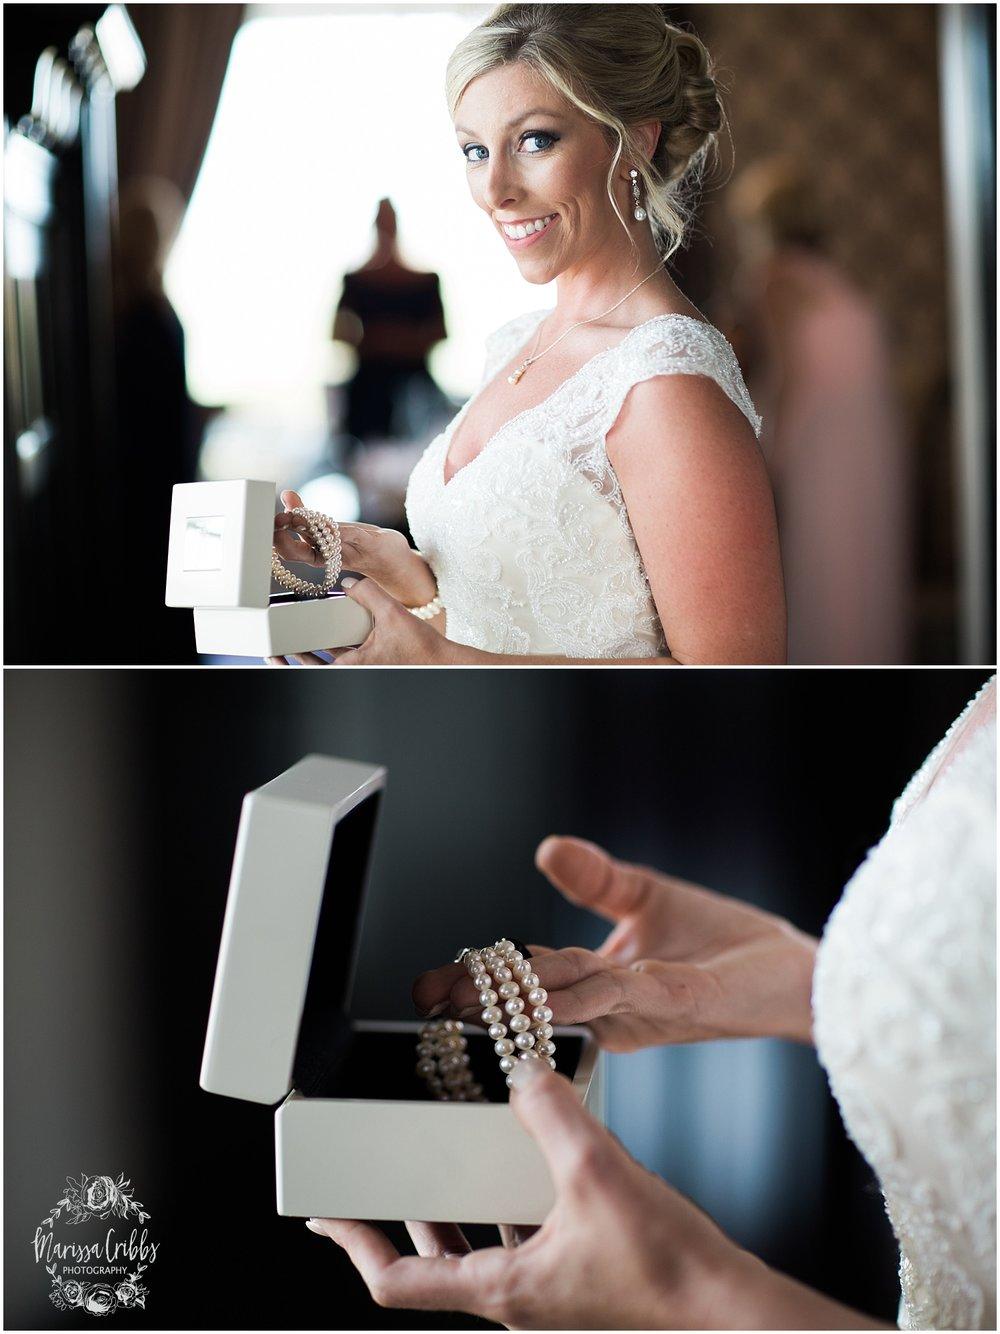 Alex & Amie | Eighteen Ninety Event Space | Marissa Cribbs Photography | Kansas City Perfect Wedding Guide_1264.jpg